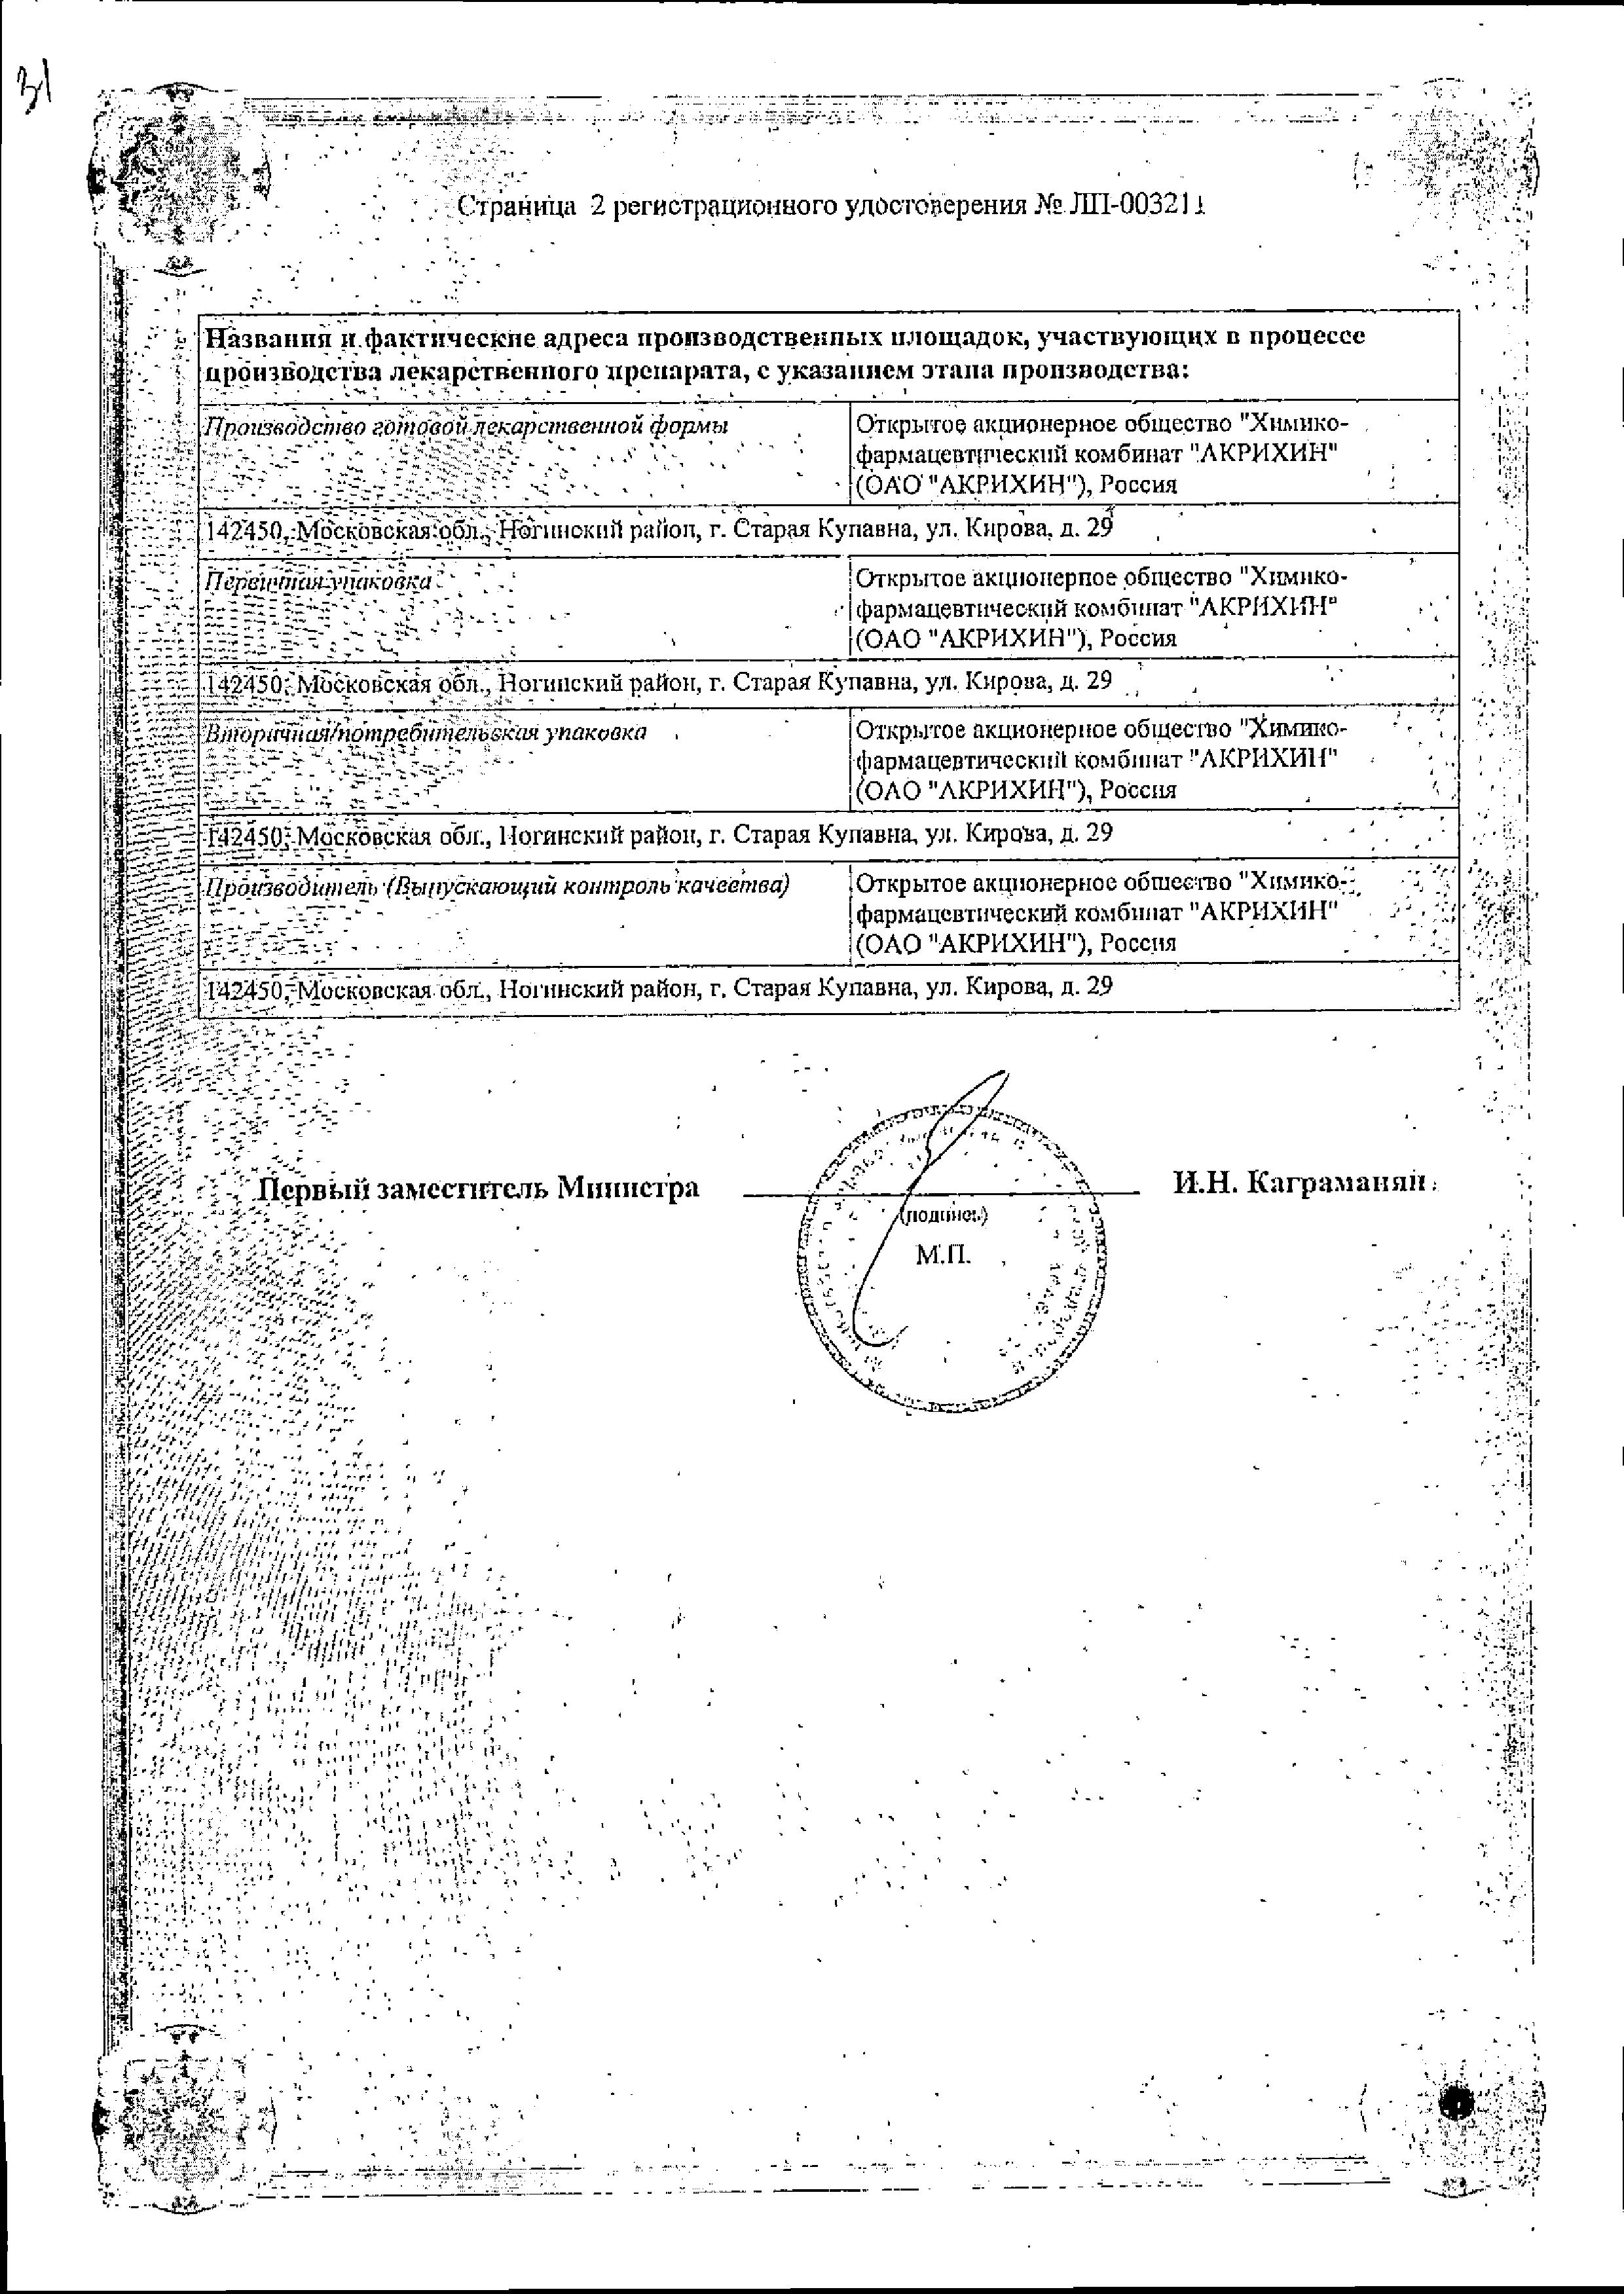 Комфодерм K сертификат